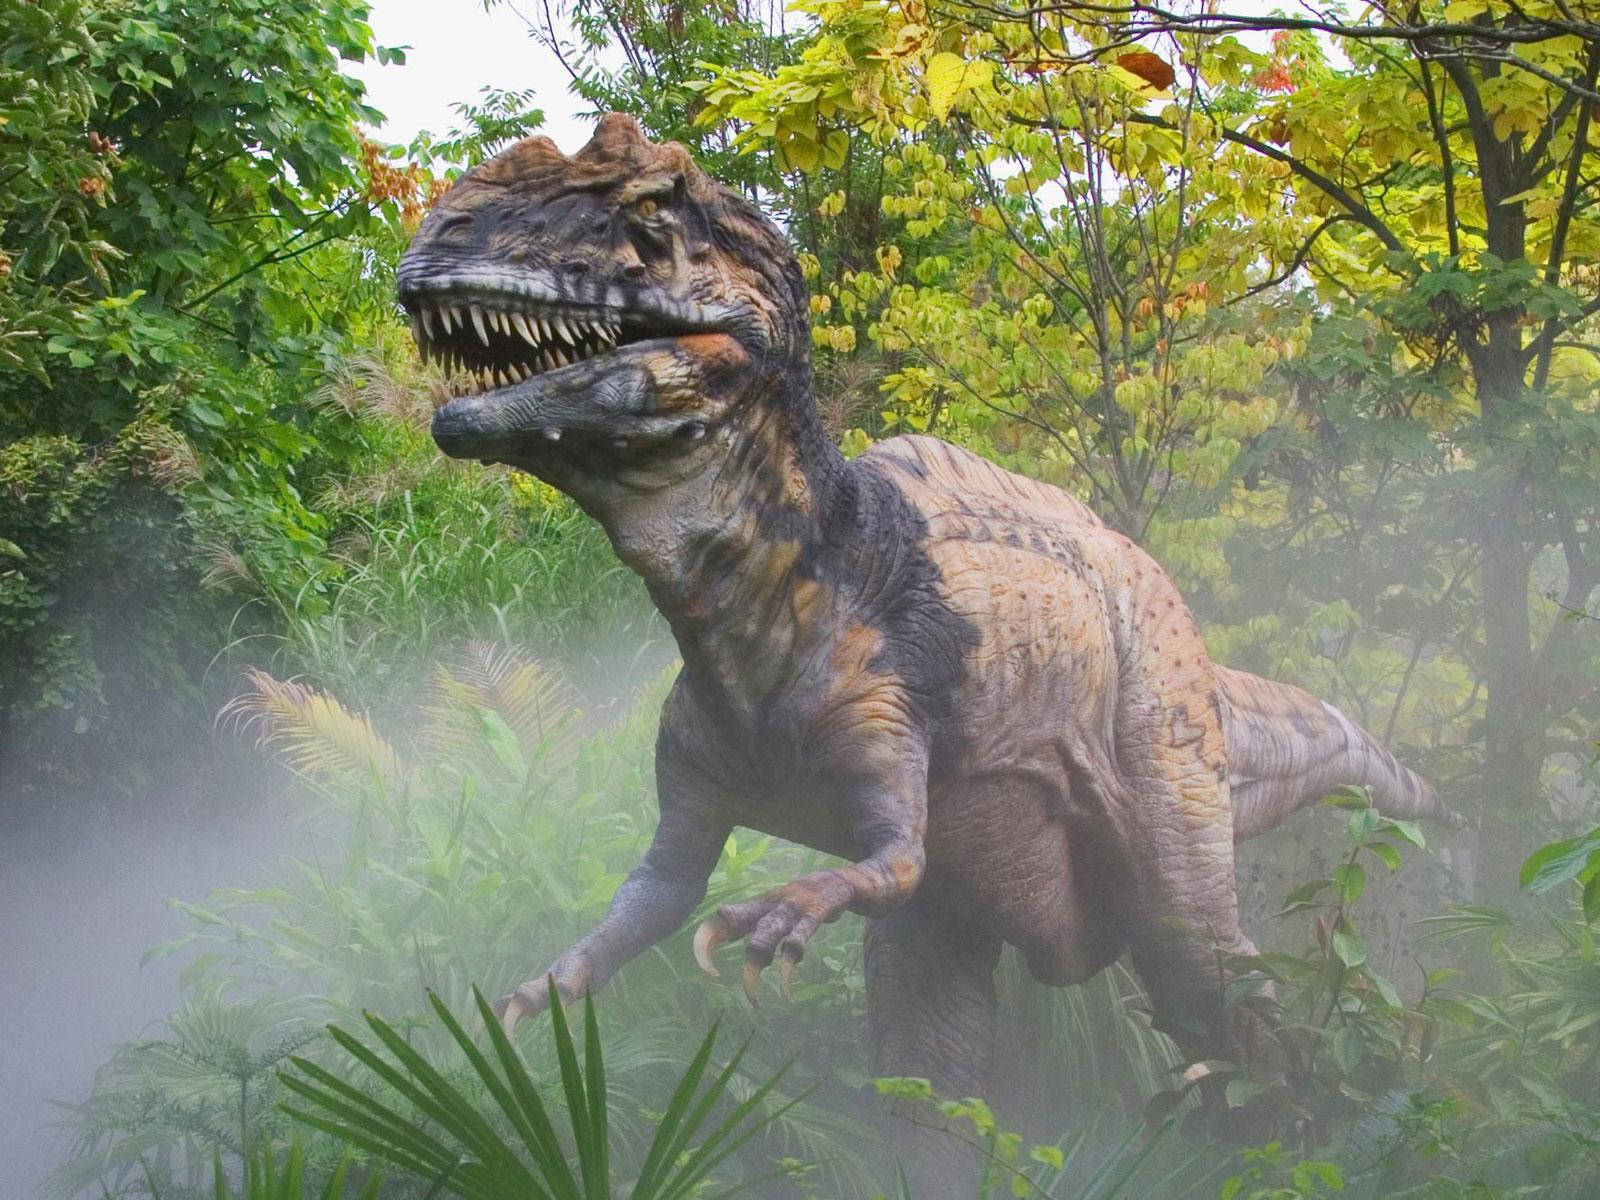 Wallpapers Film en serie Jurassic parc